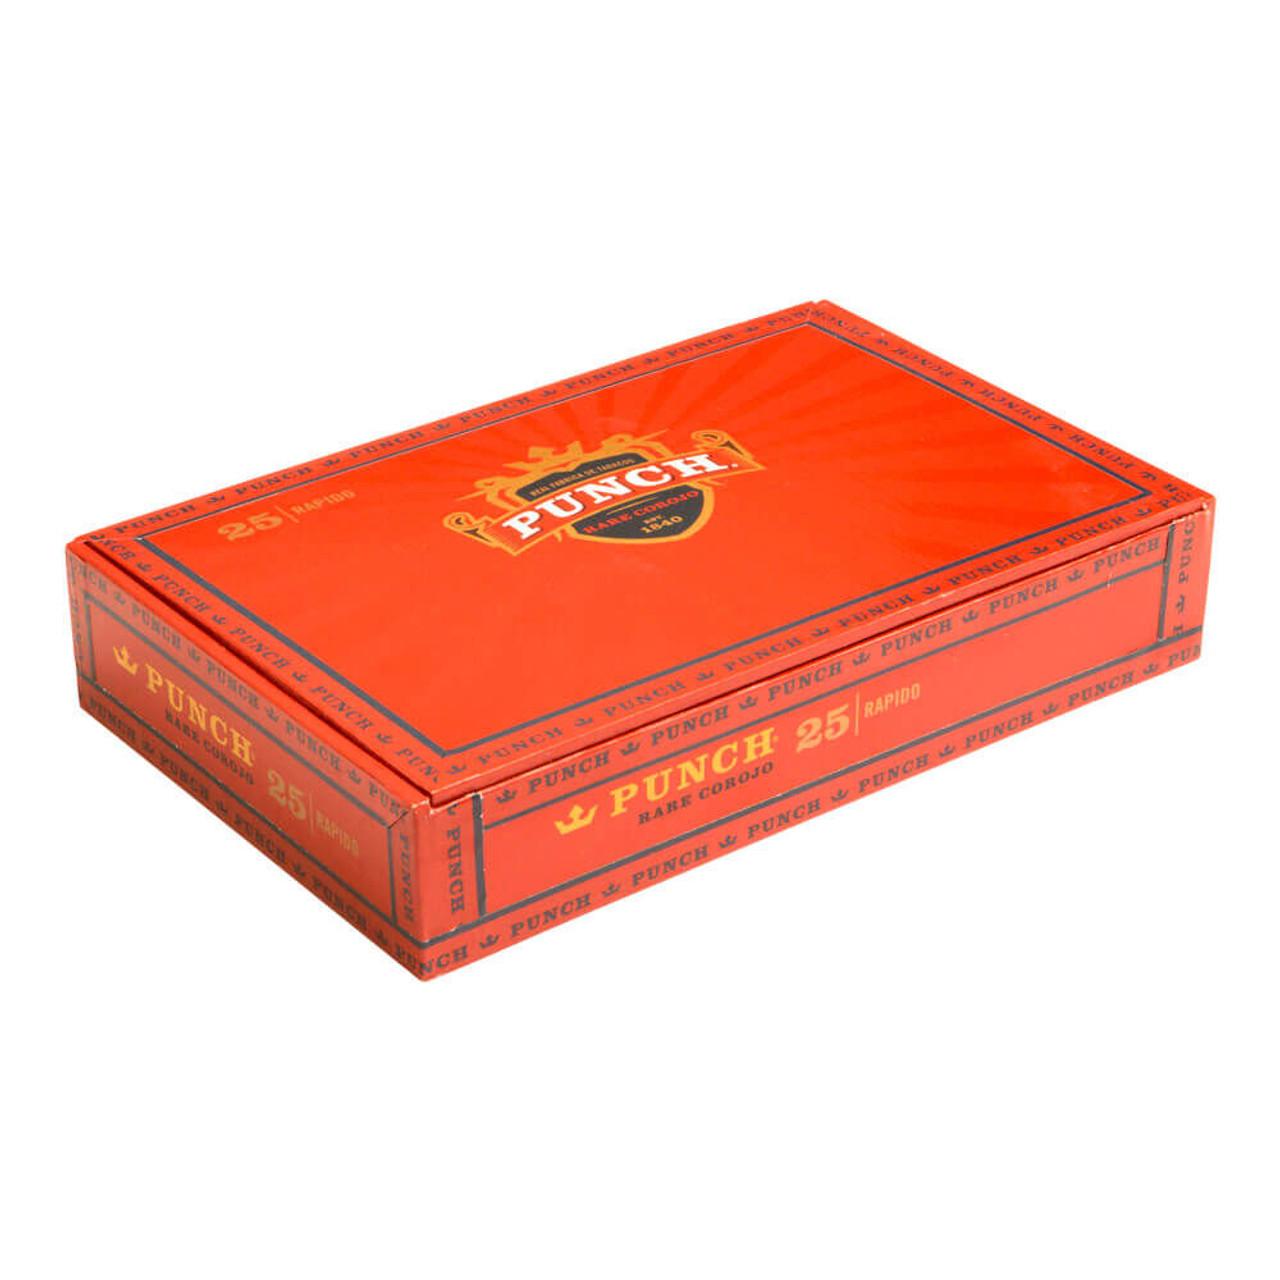 Punch Rare Corojo Rapido Cigars - 5 x 40 (Box of 25)